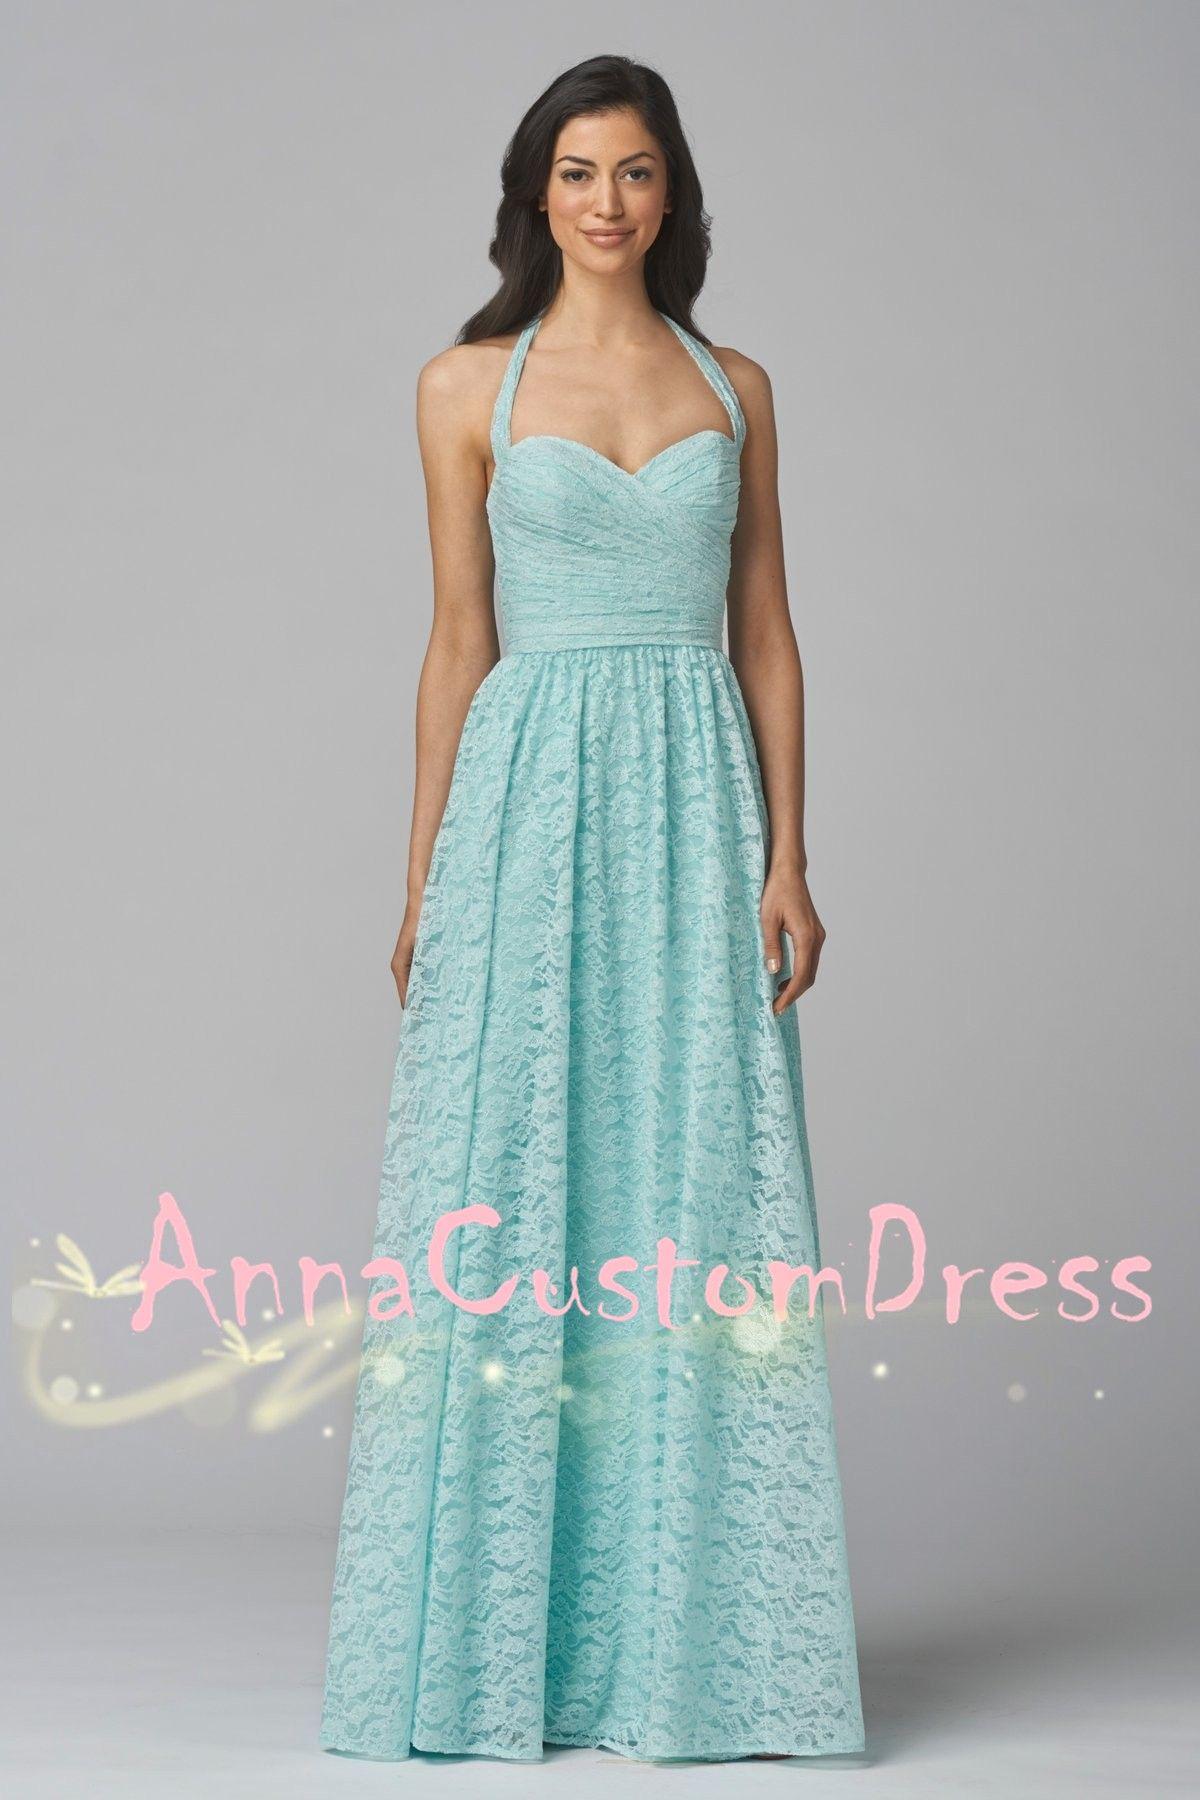 Halter light sky blue lace long bridesmaid dress popular